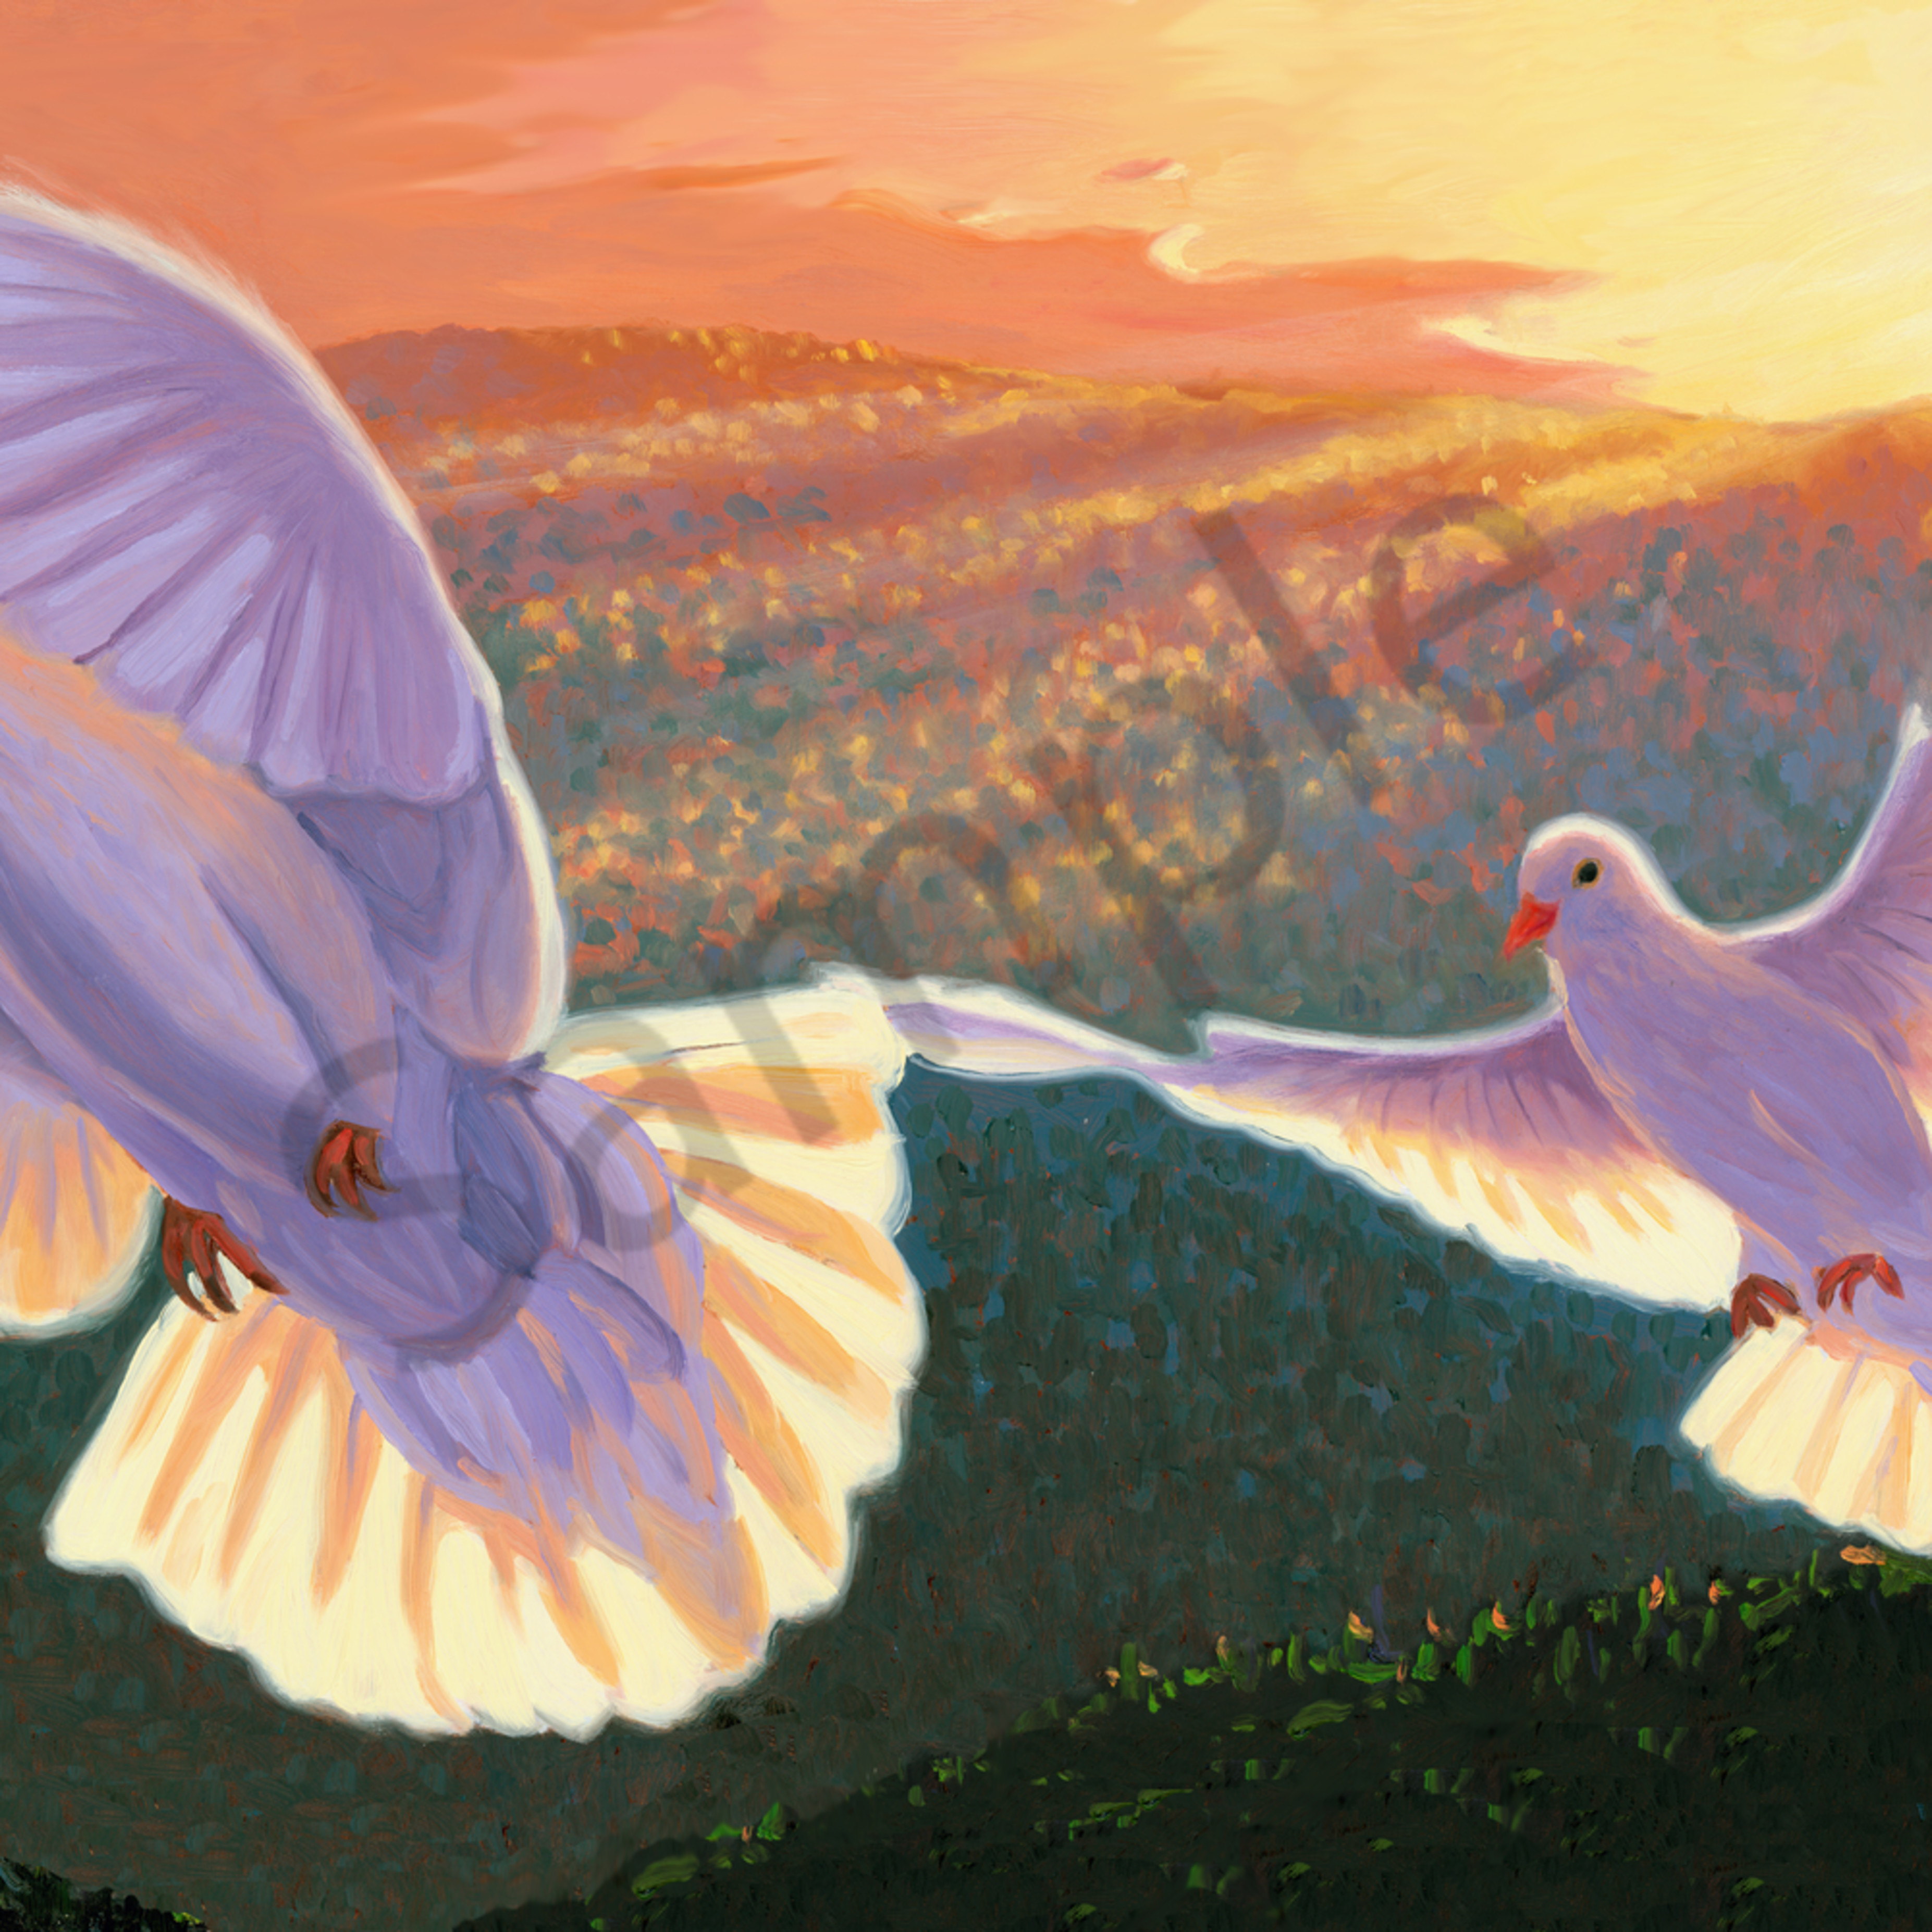 Doves wenknd